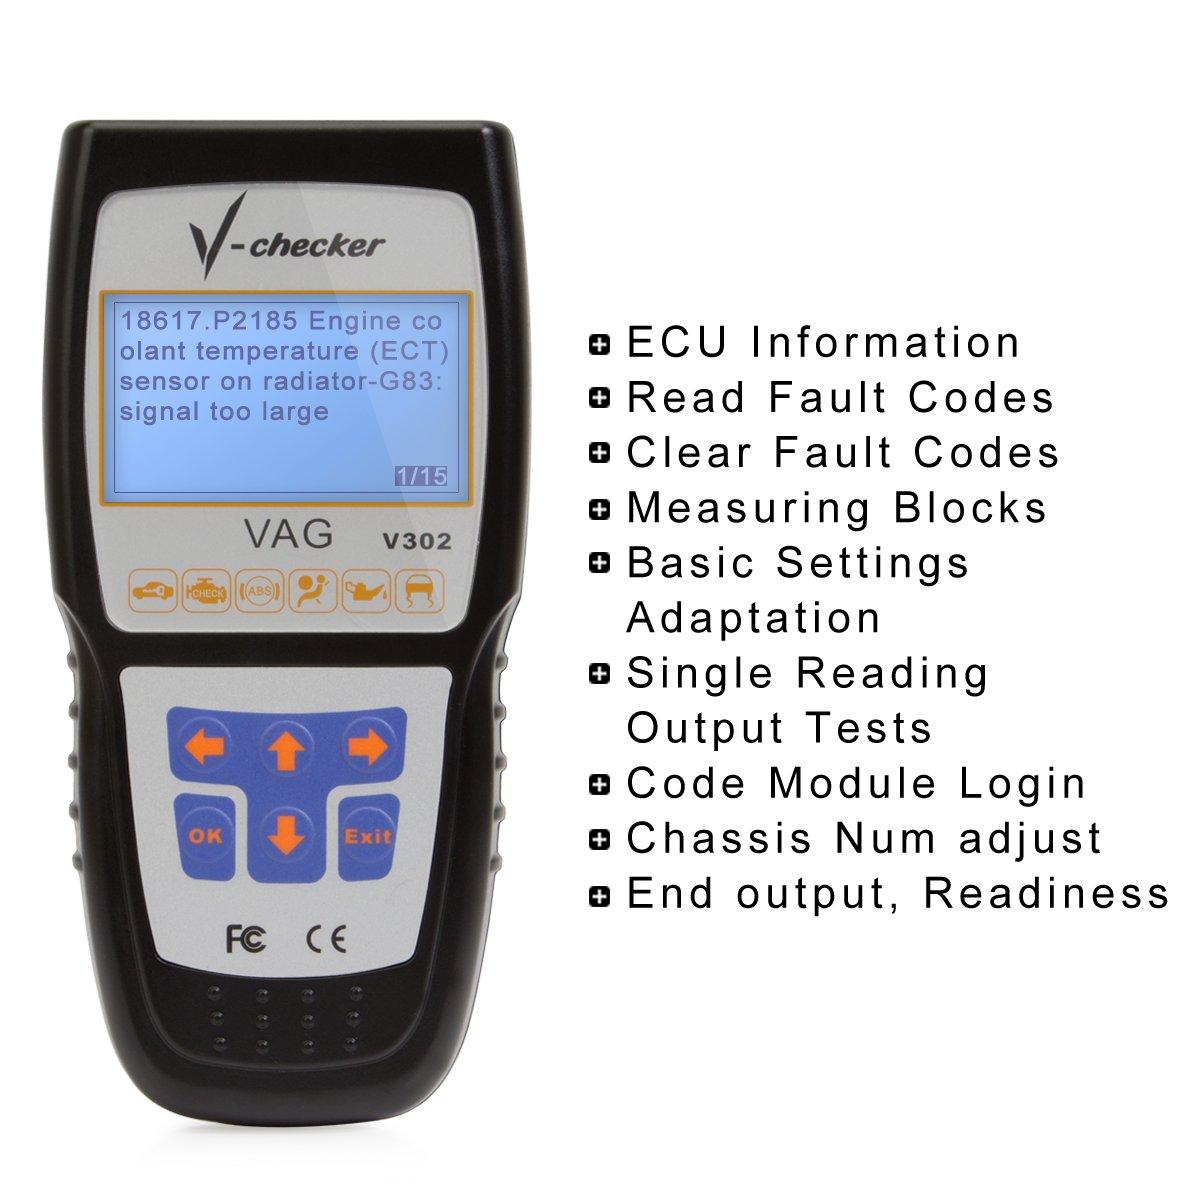 VAG Audi Volkwage Skoda Seat Scanner Vag Com Car Code Reader Fault Code Clear Diagnostic Scan Tool For VW Audi Skoda Seat by Autodiag (Image #3)